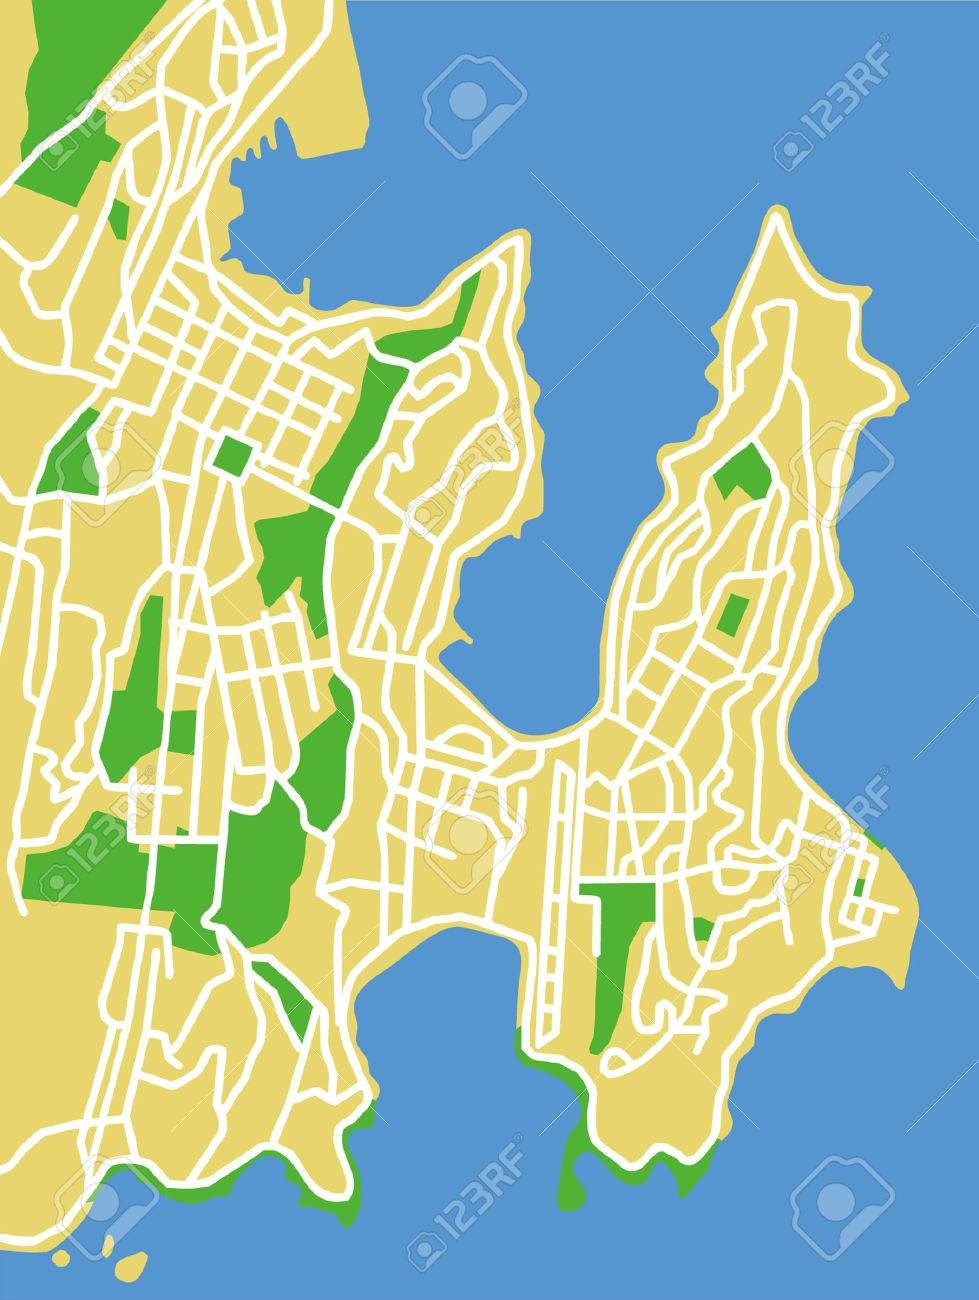 Map Of Wellington New Zealand.Vector City Map Of Wellington New Zealand